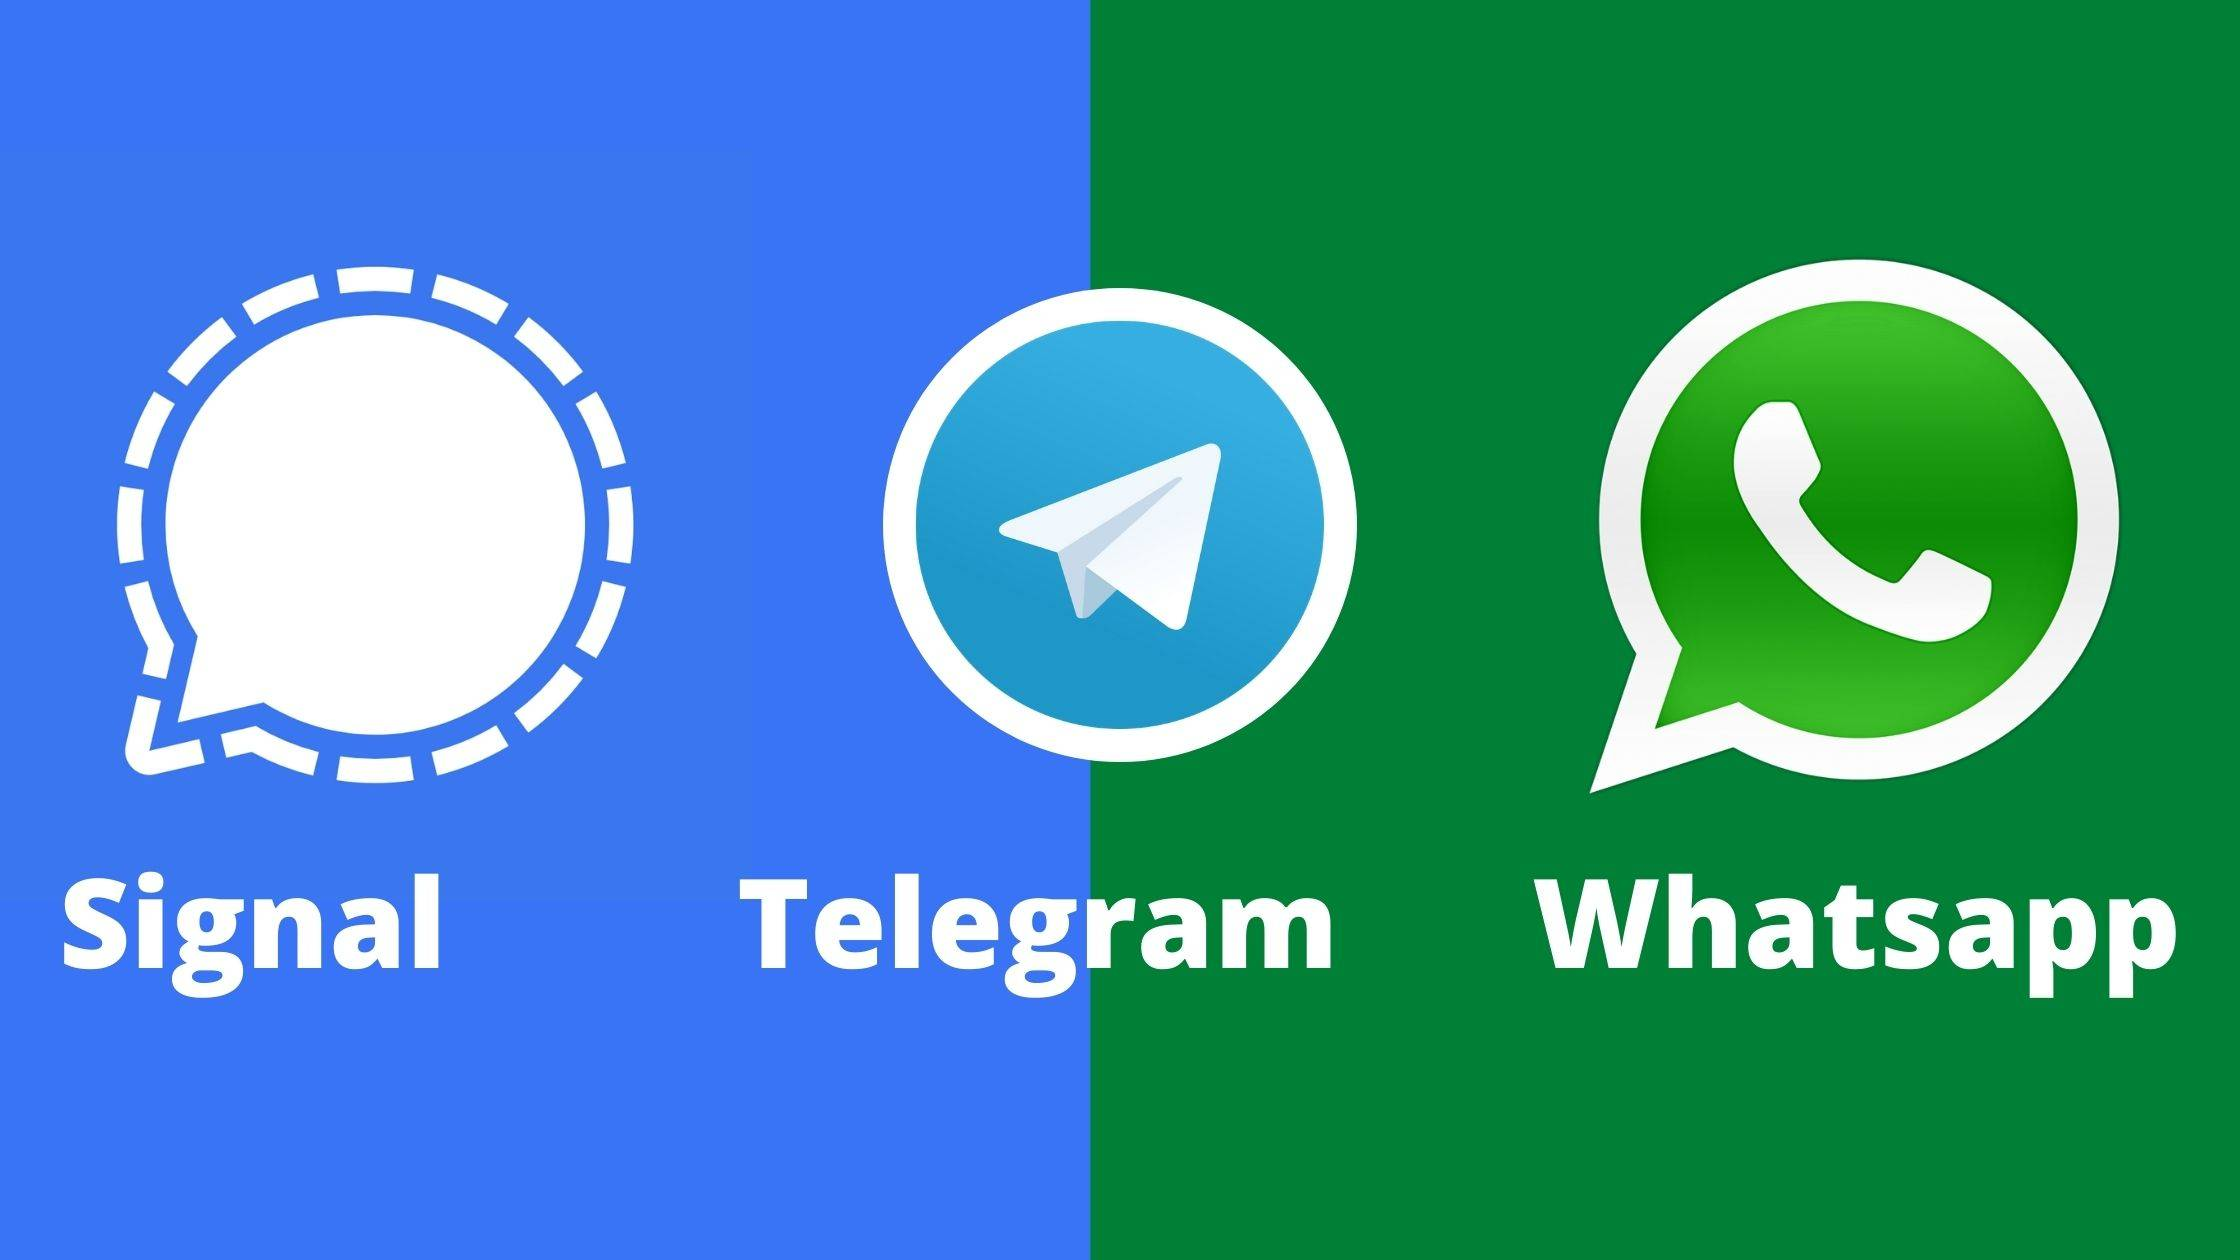 واتساپ، سیگنال و تلگرام